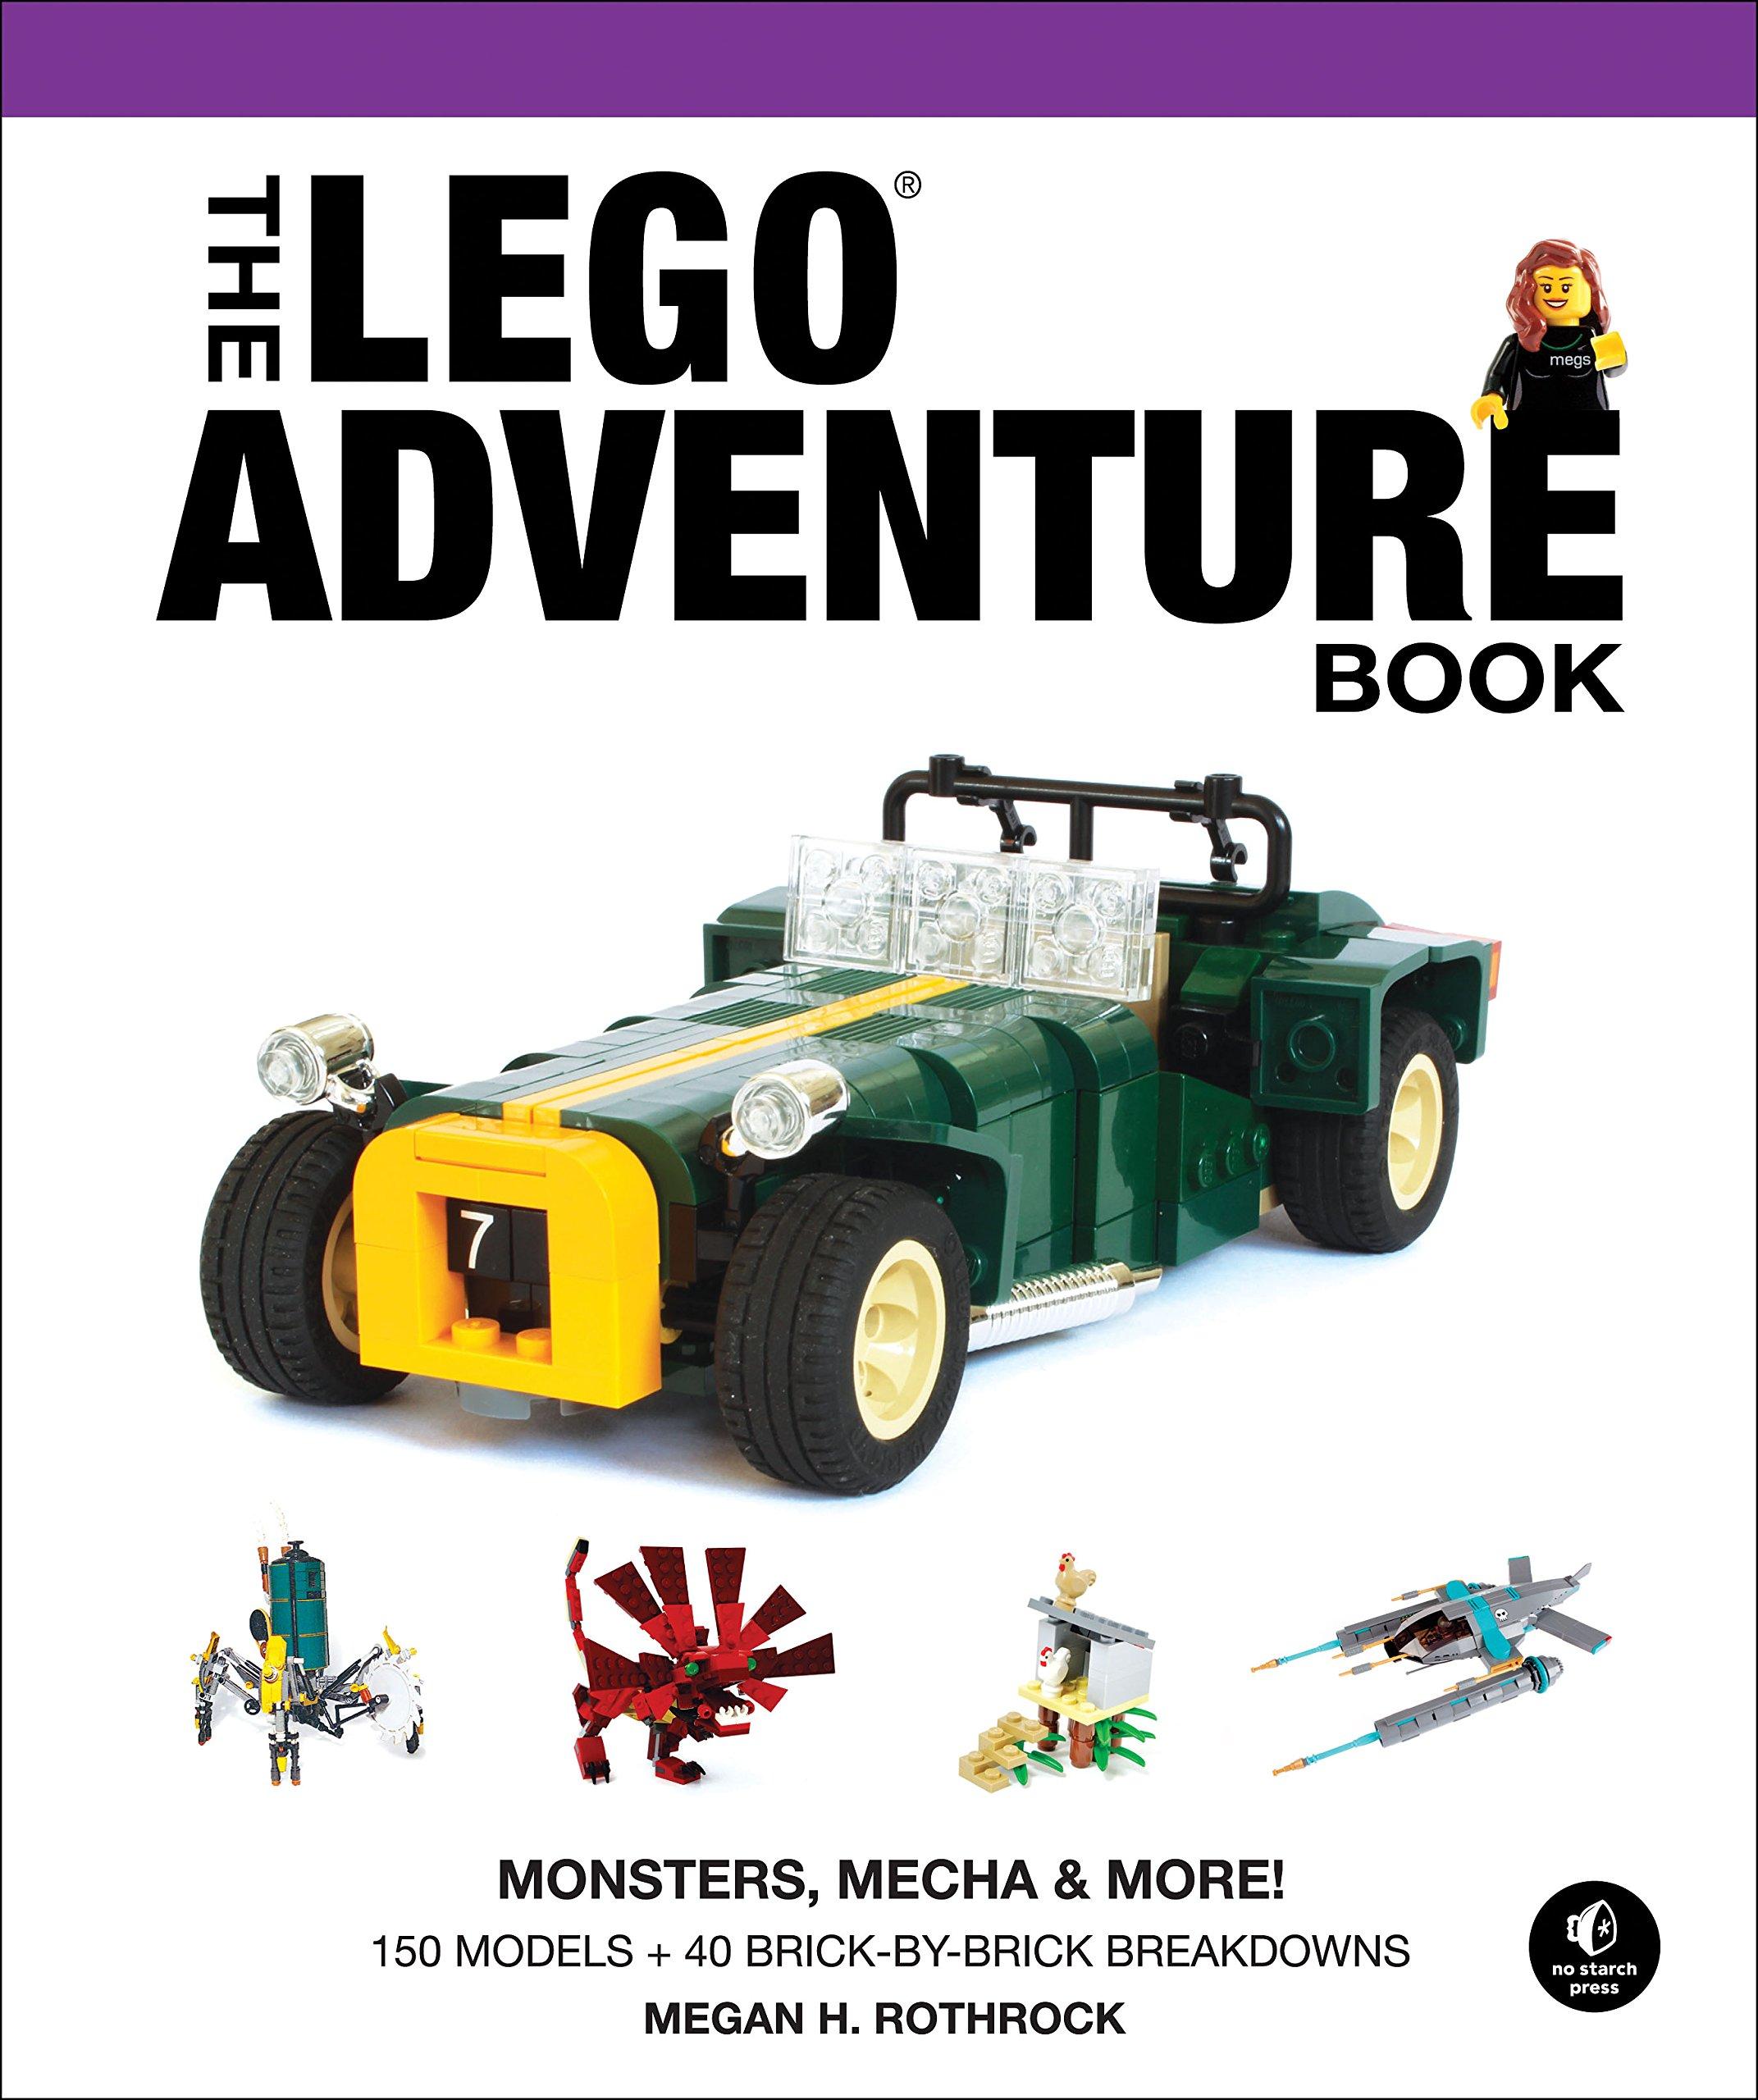 The lego adventure book vol 4 monsters mecha more megan h rothrock 9781593277635 amazon com books